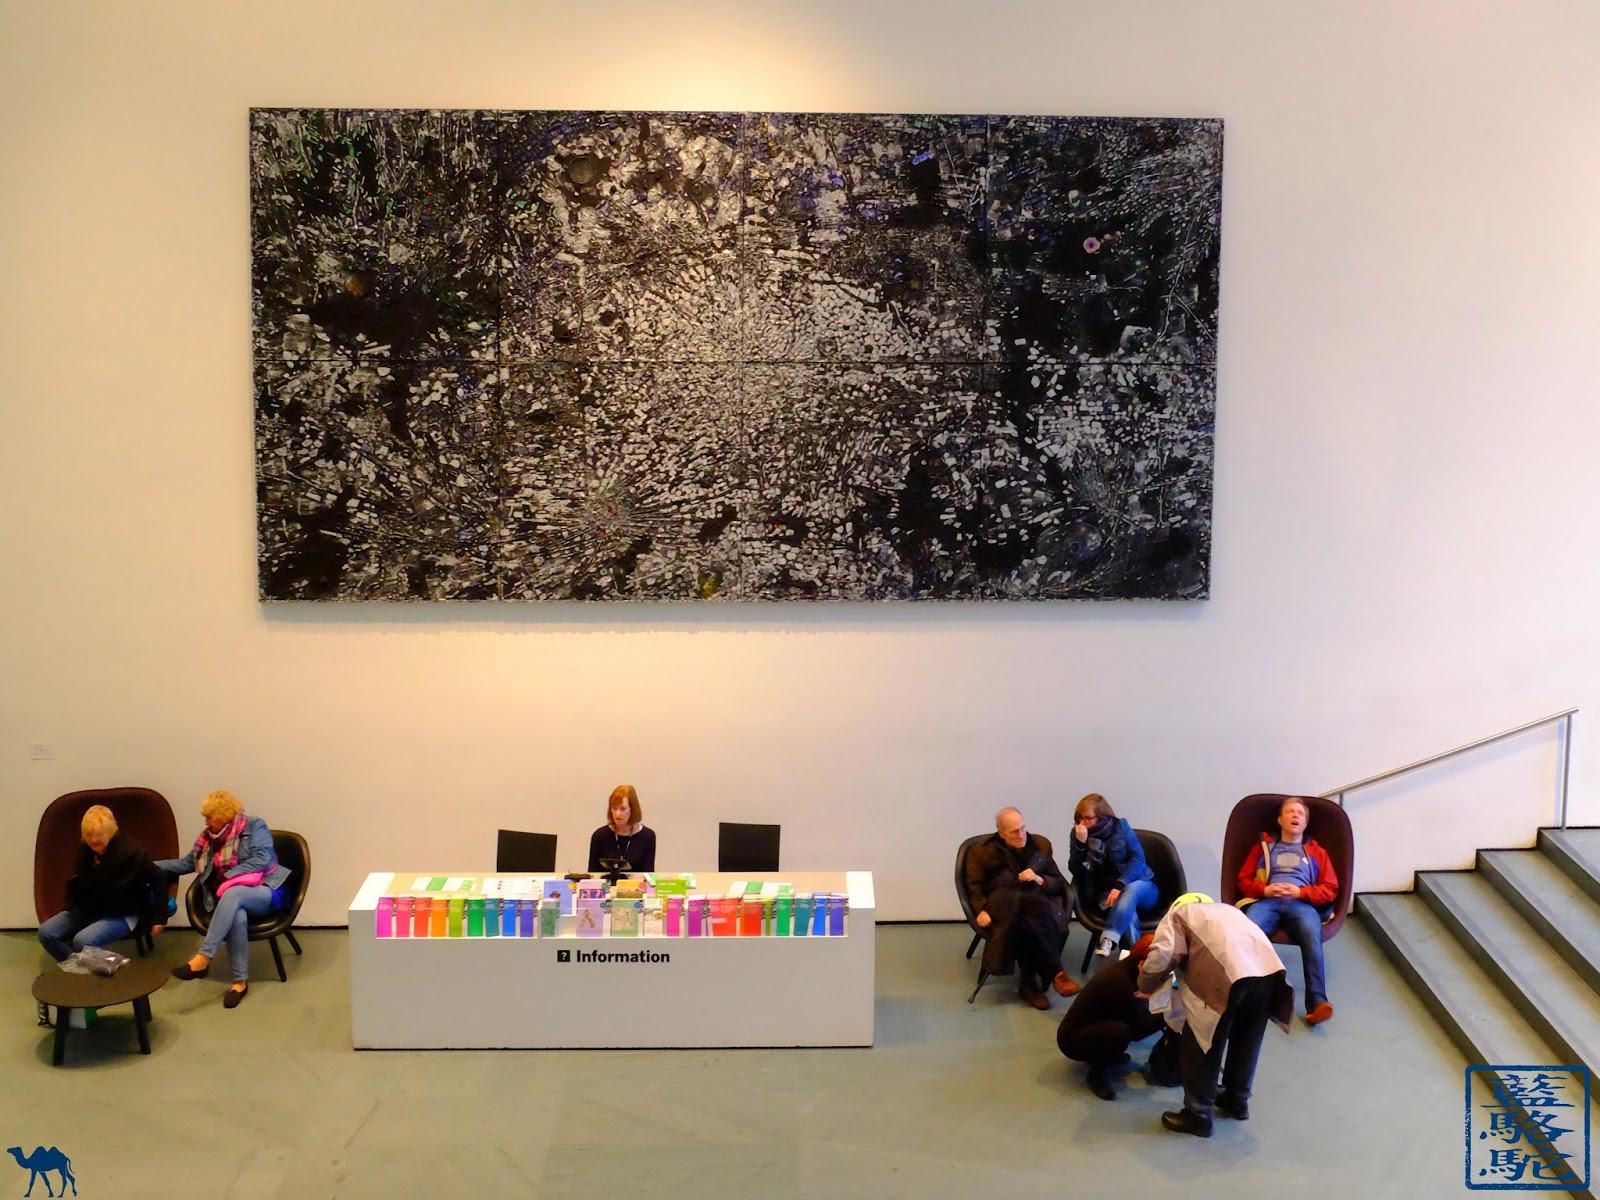 Le Chameau Bleu - New York - Oeuvre  du MoMa